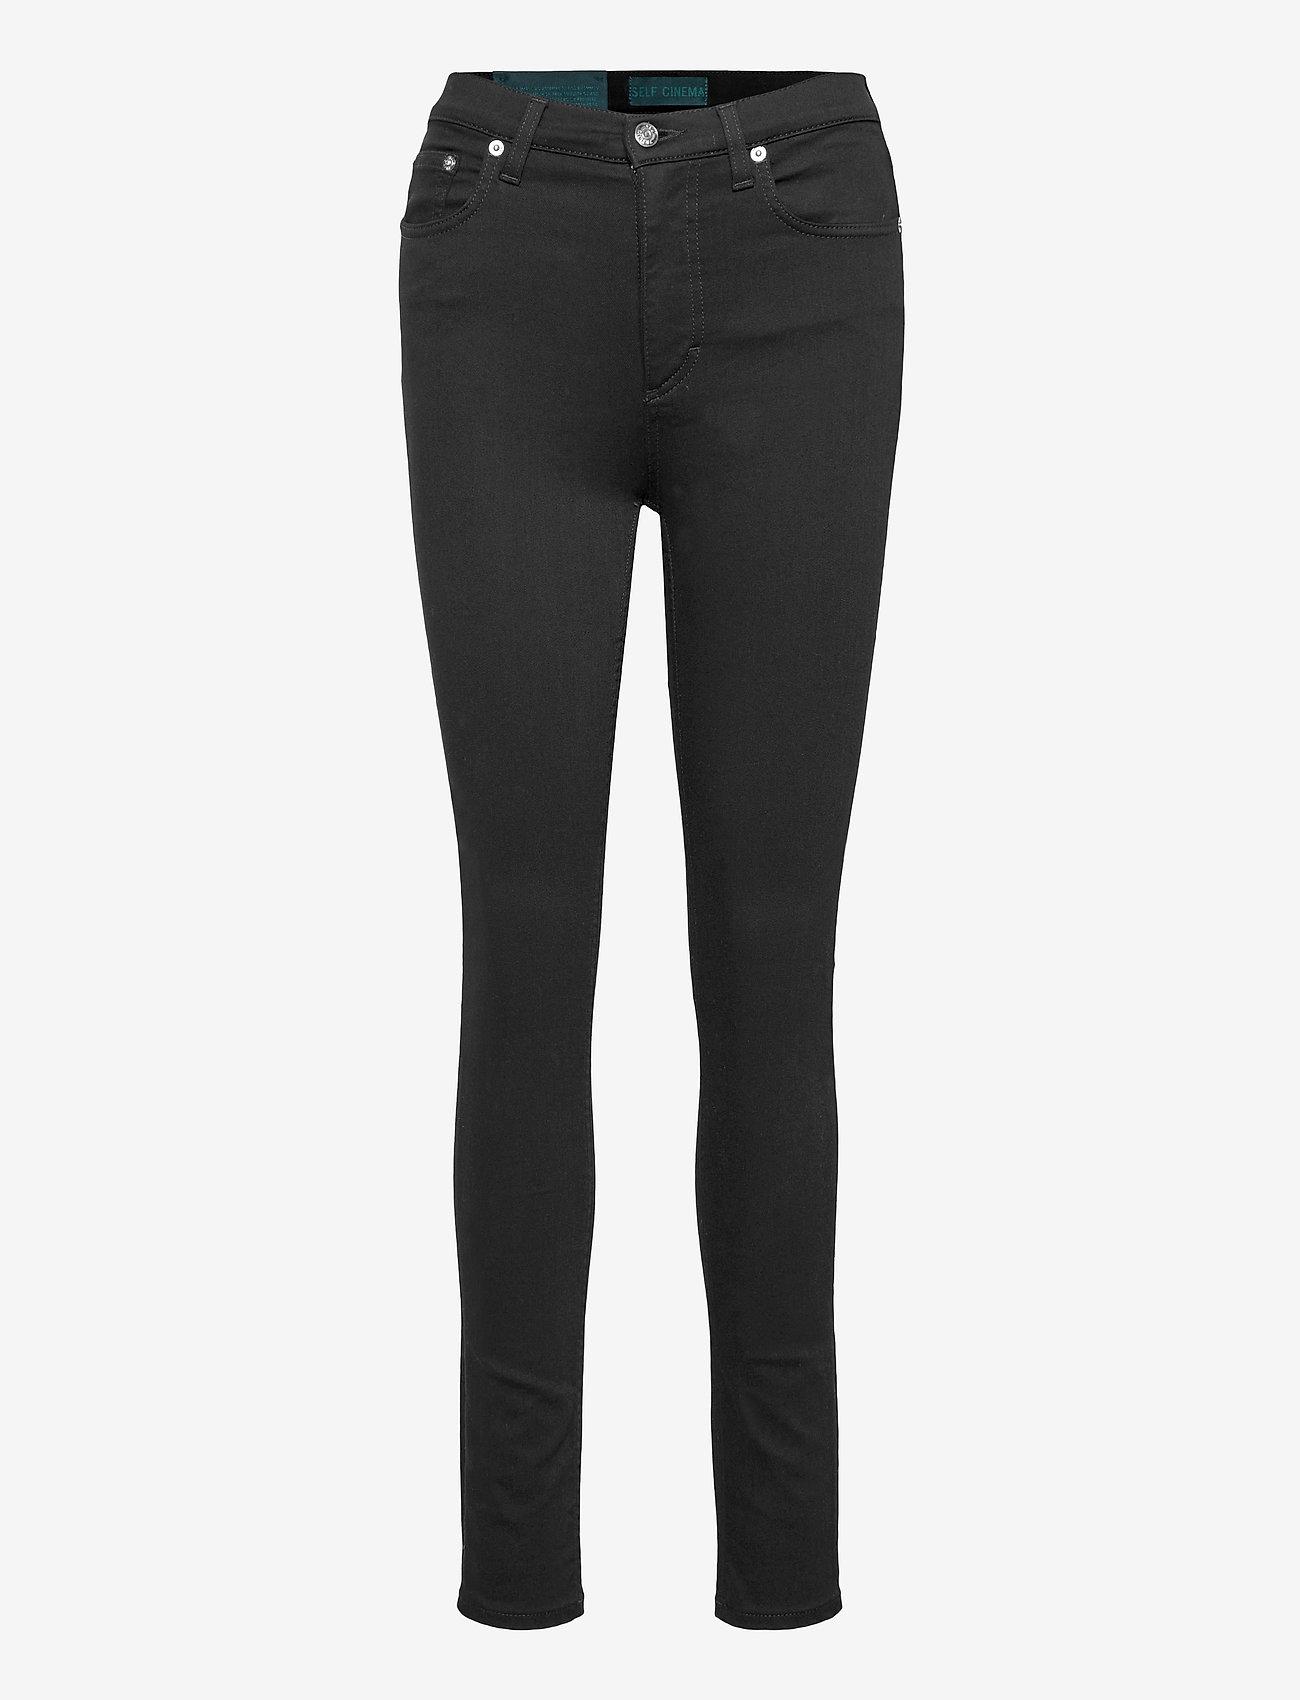 Self Cinema - Womens Skinny Jean - skinny jeans - stay black - 0